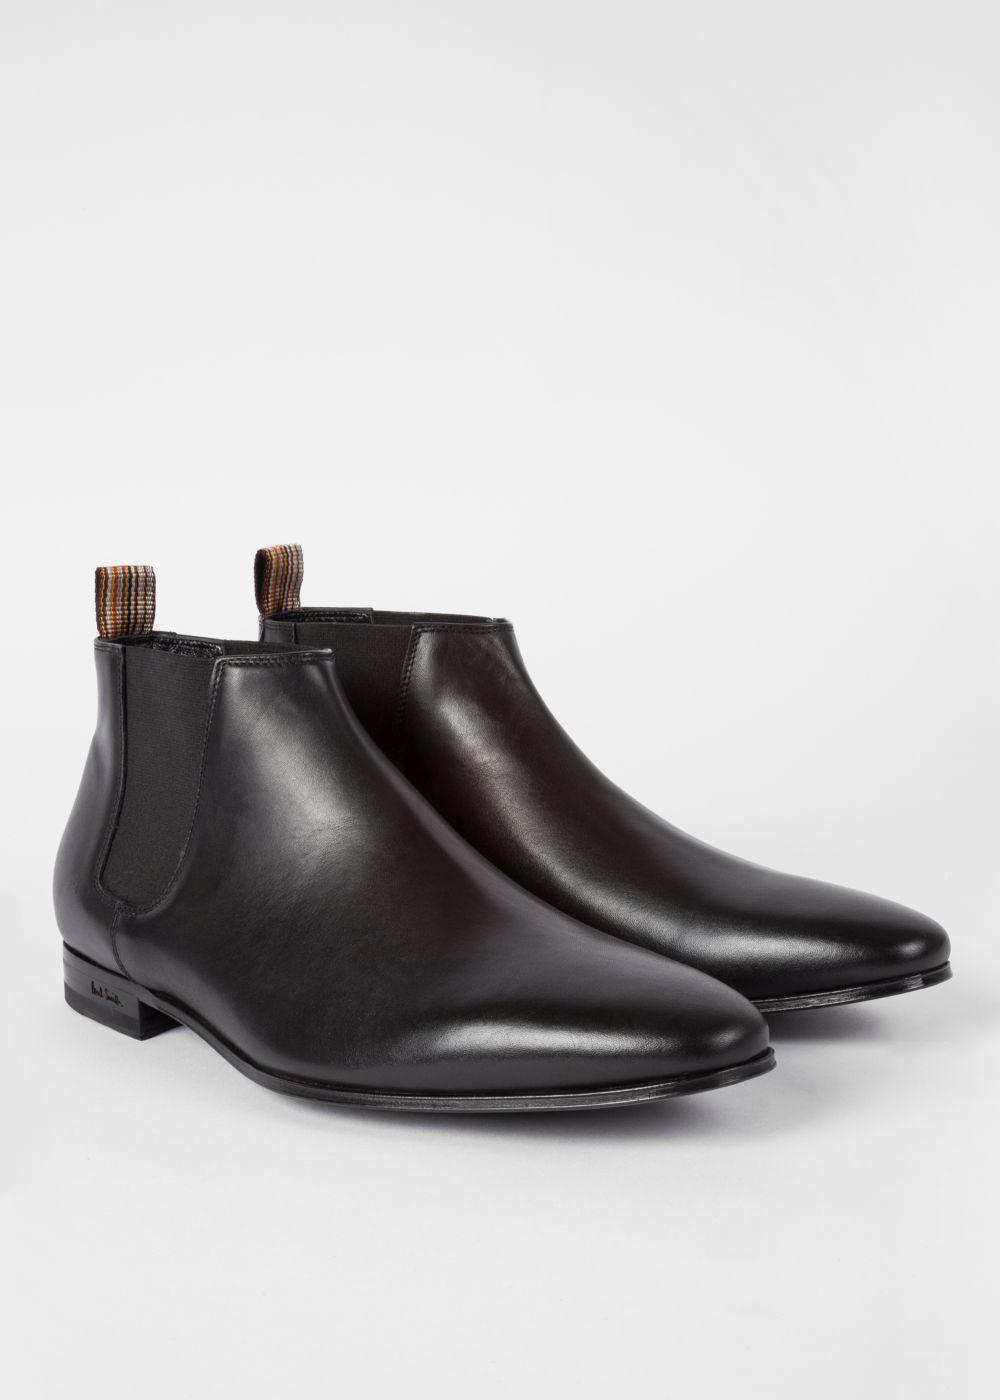 adidas Originals Tan Suede Marlowe Chelsea Boots EJ4zOfCqjq